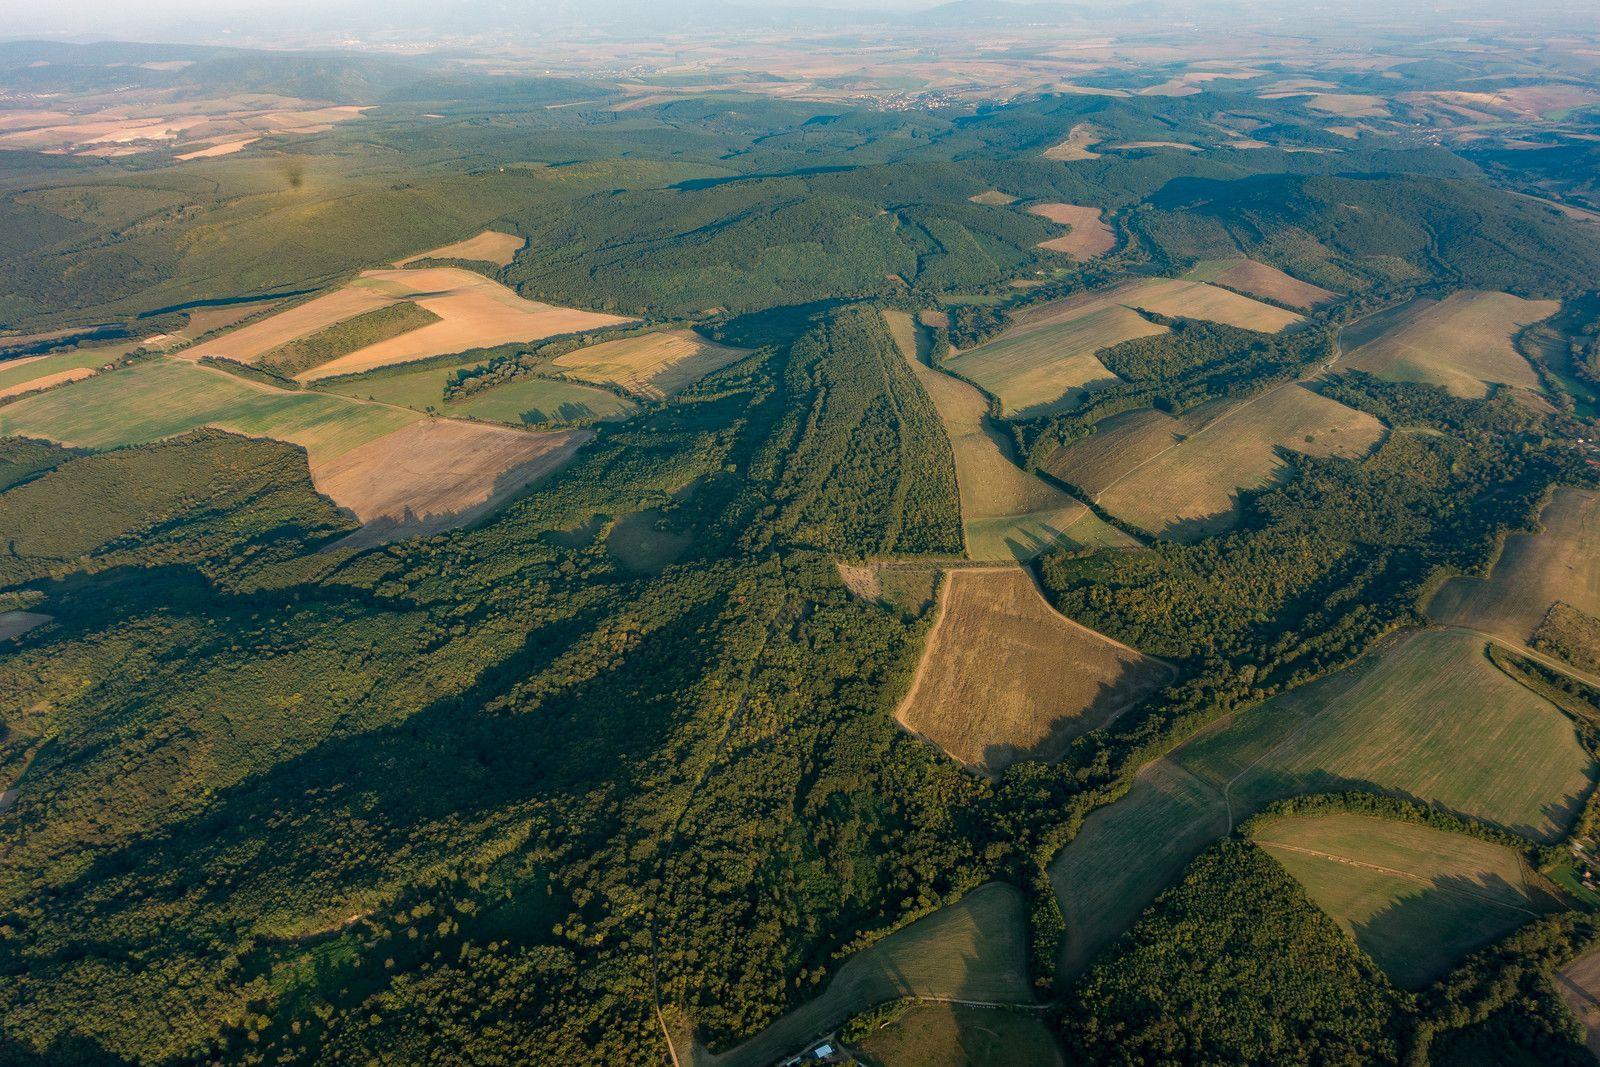 hills of Cserhat